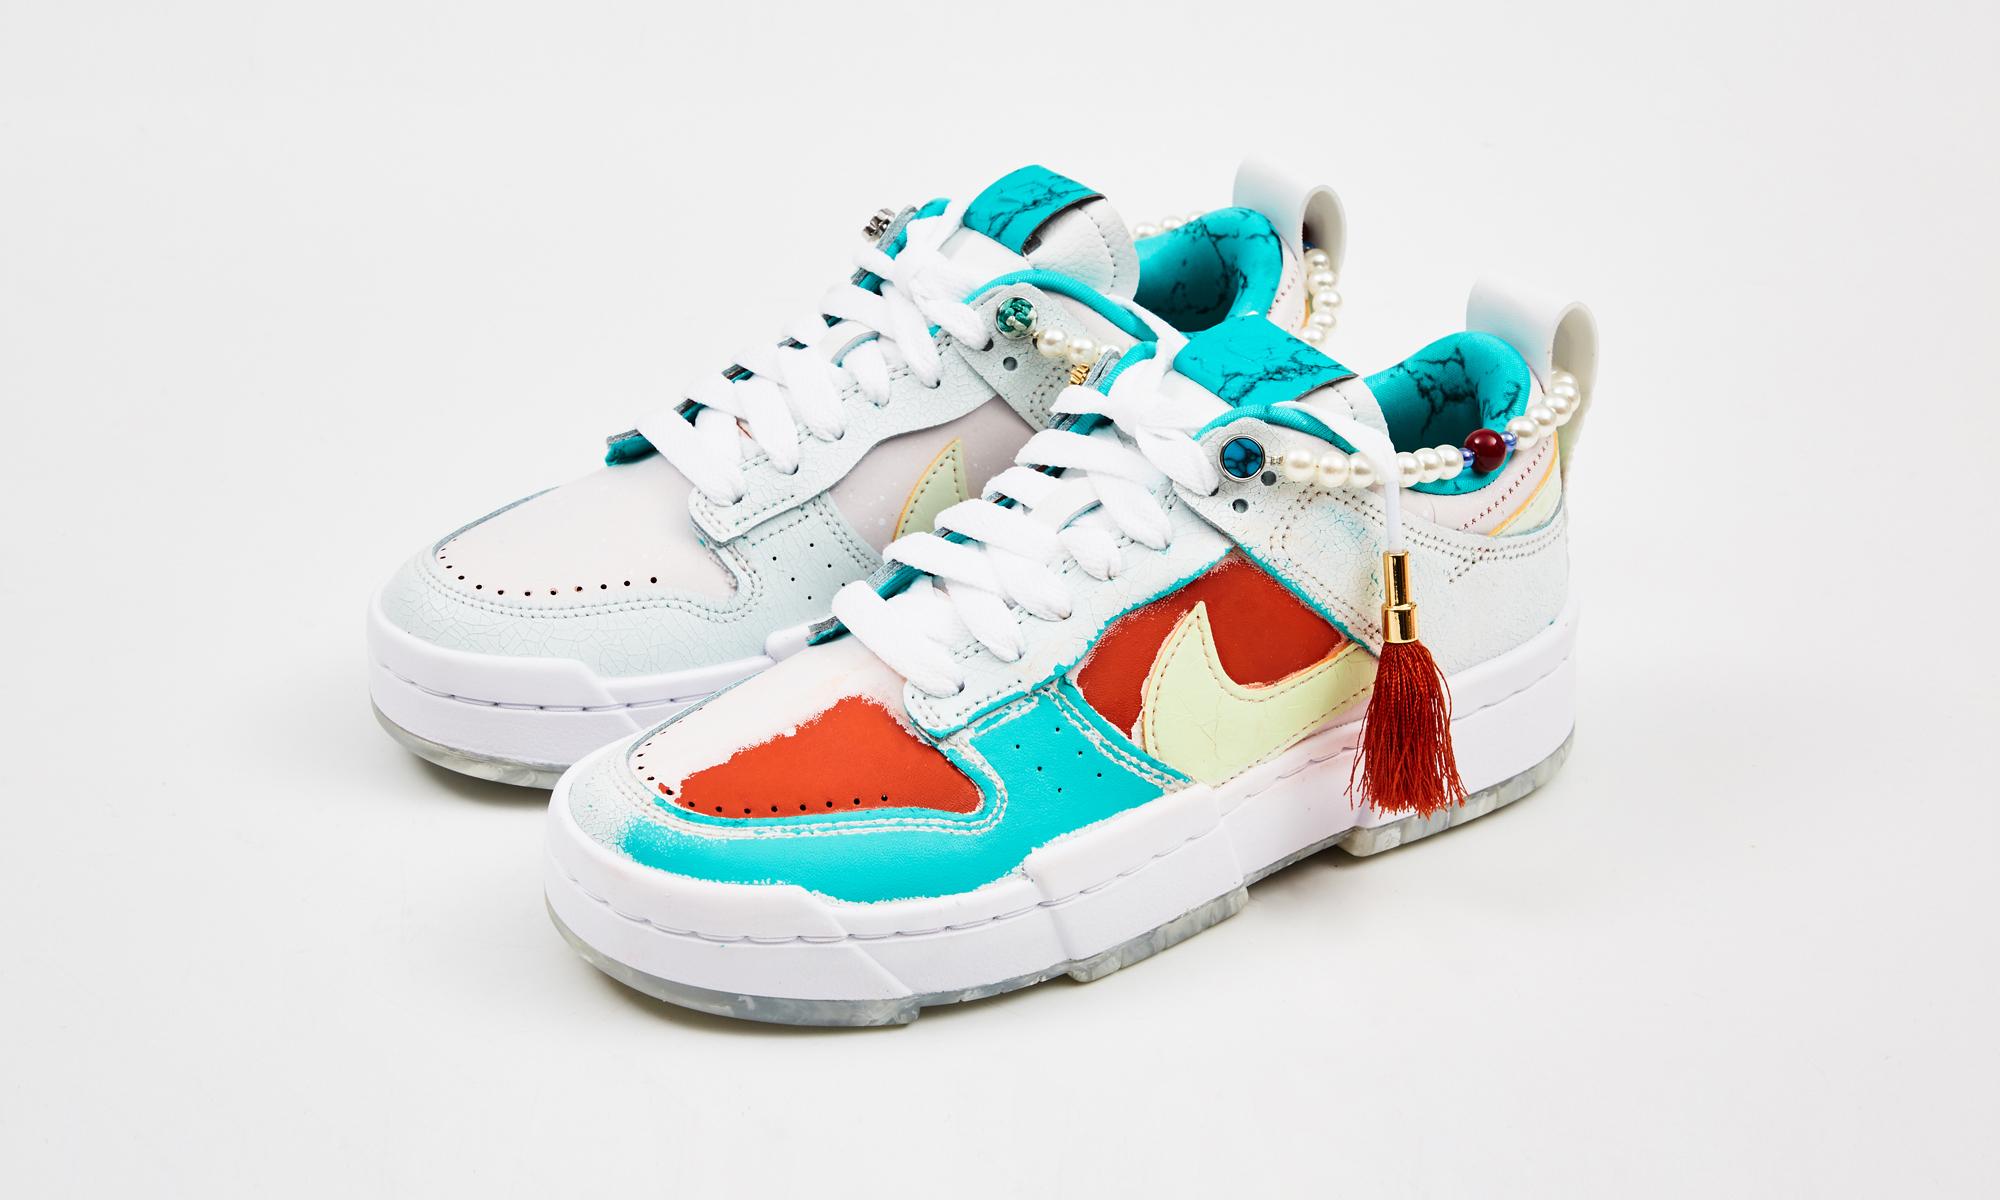 鞋圈共振,SOULGOODS 特别呈现 Nike Dunk Low Disrupt 中国风发售派对